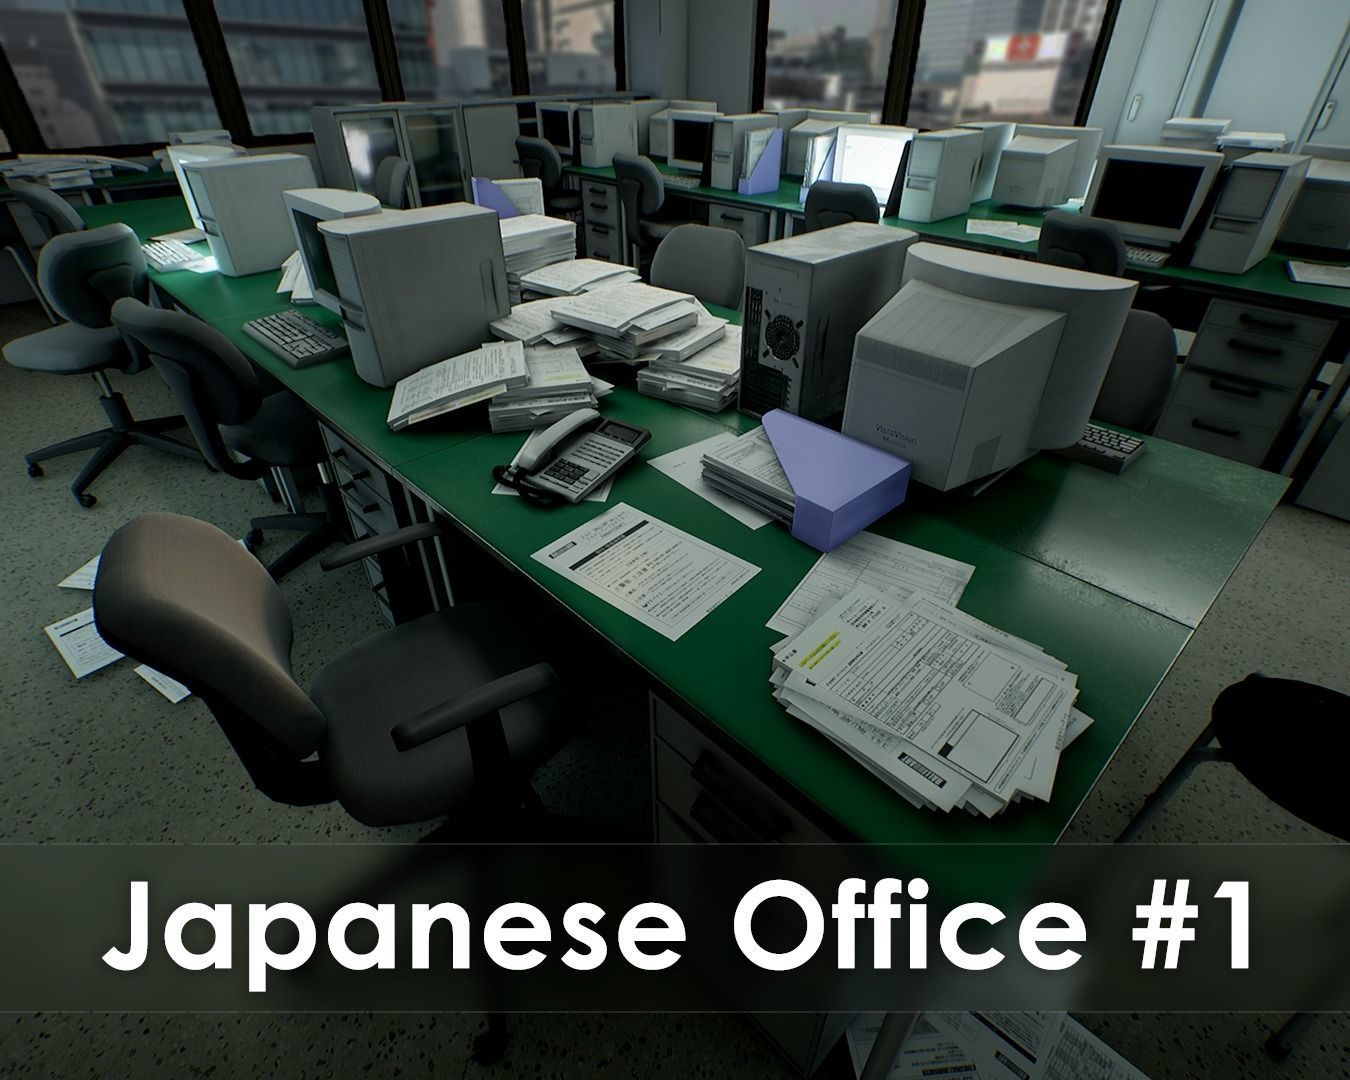 Japanese Office Pack - Over 100 Models